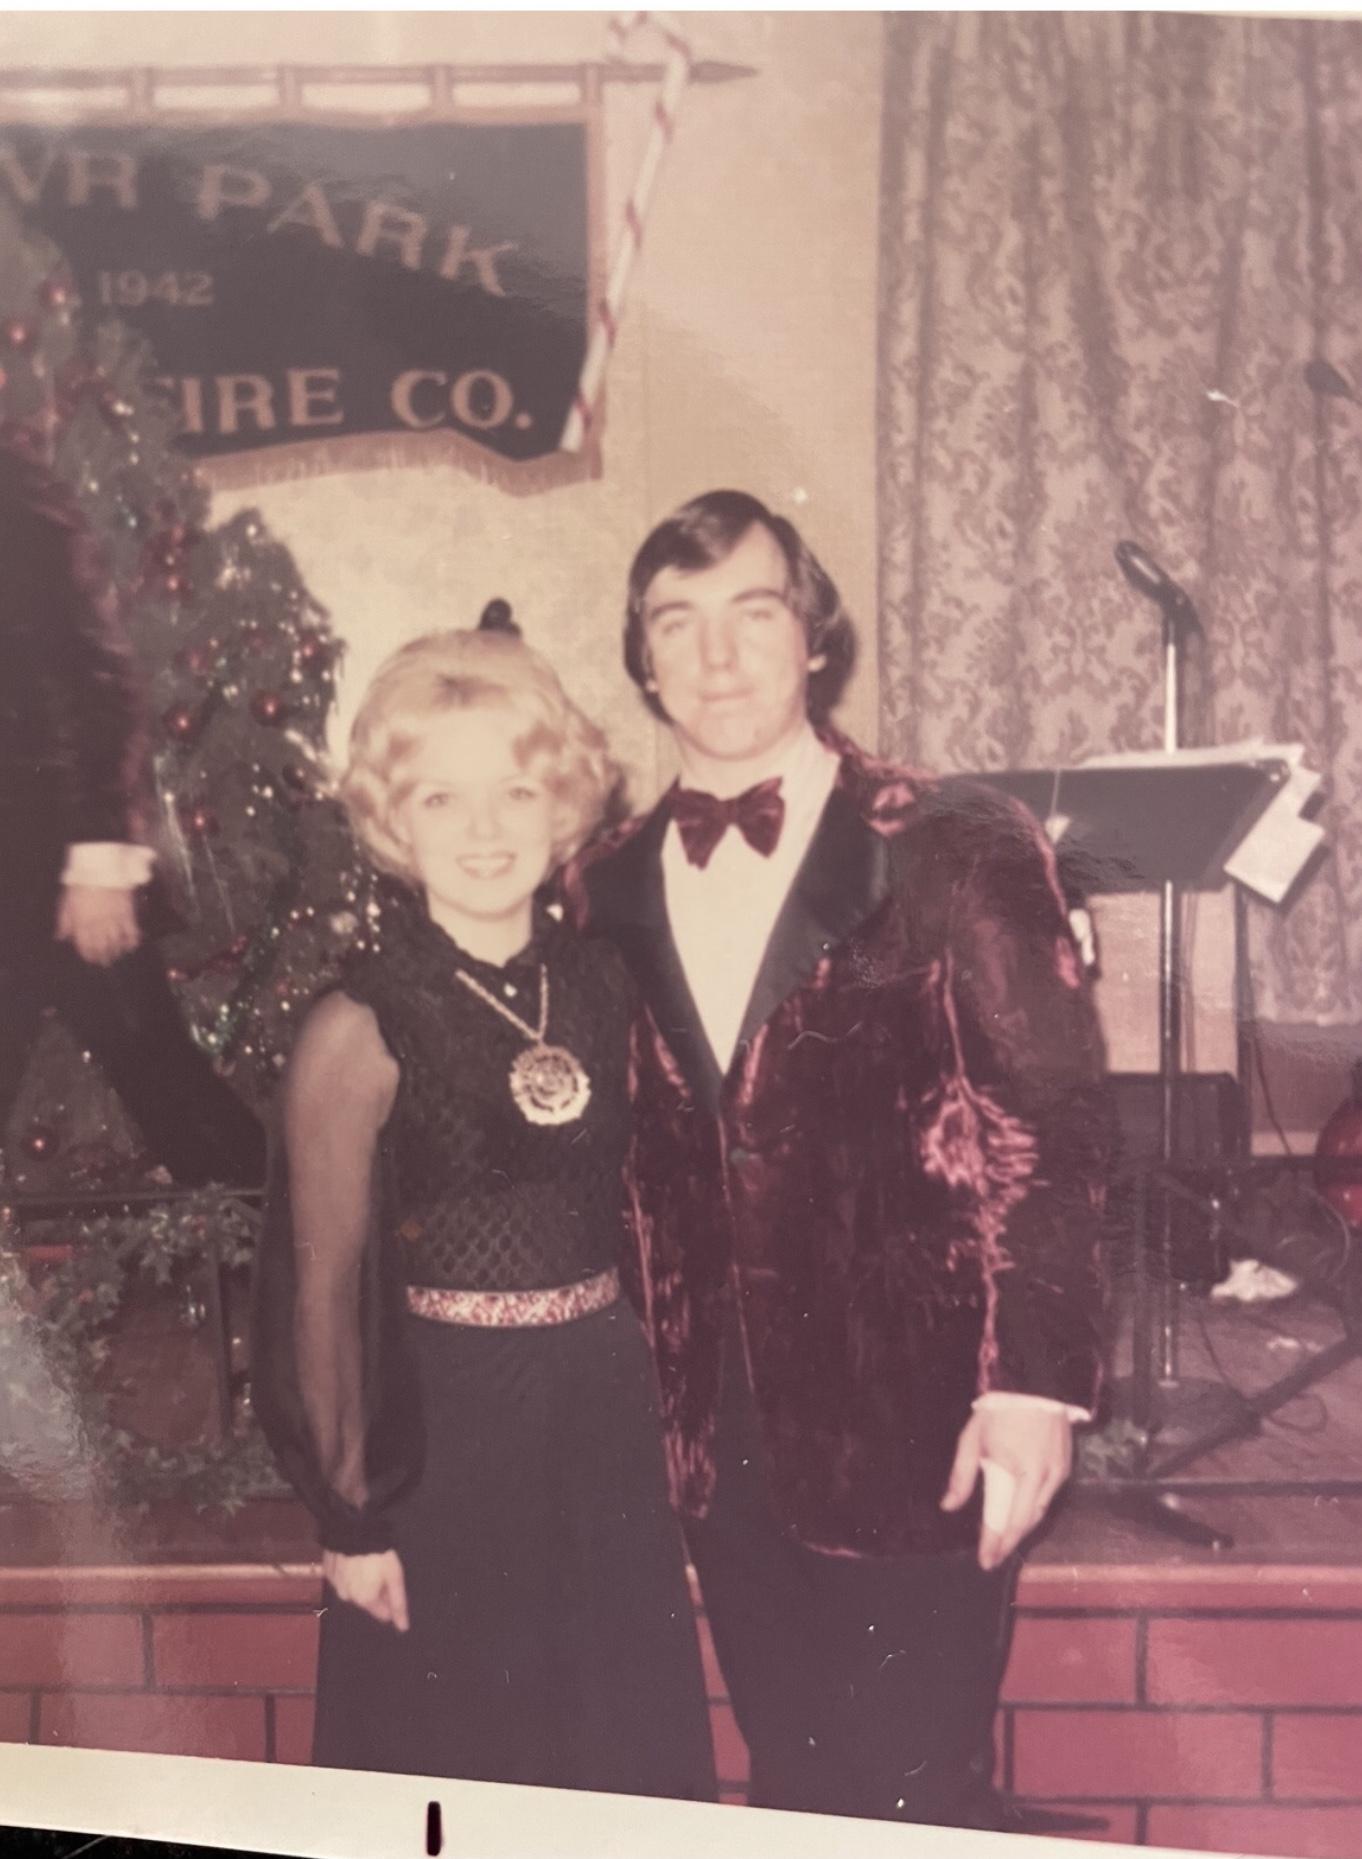 Linda & Frank 1970's